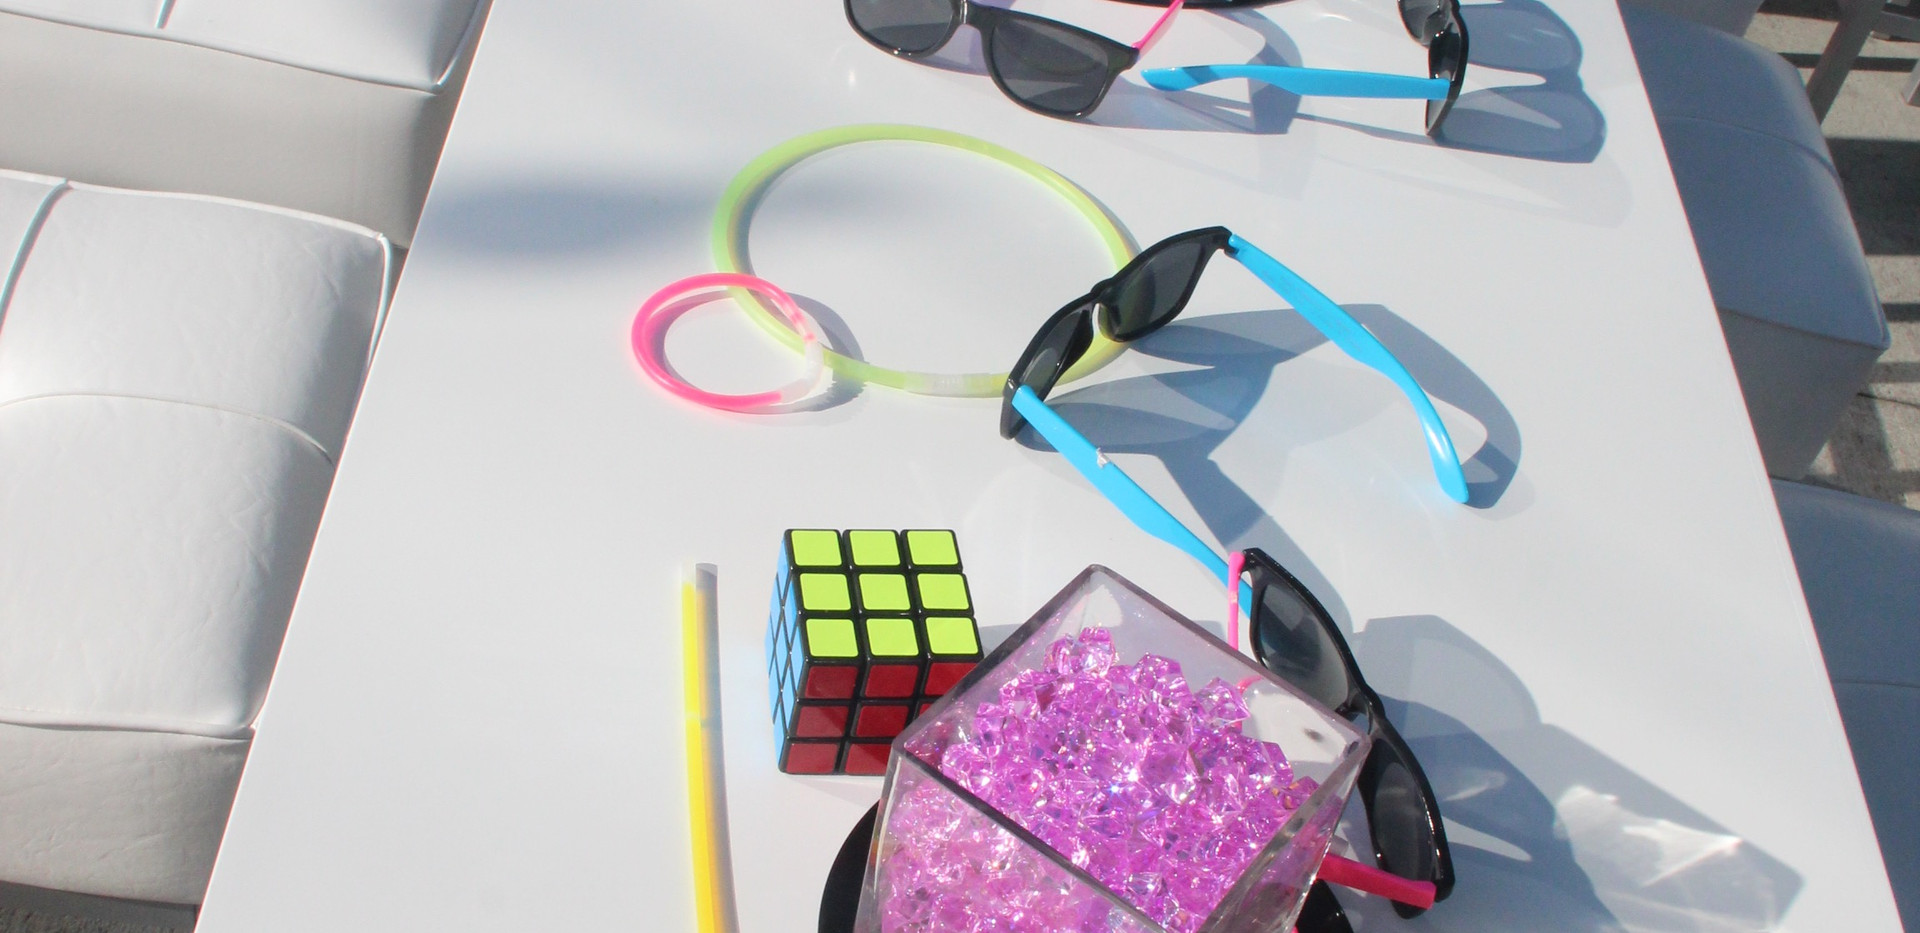 Gem Cube Communal Table Gaming.jpg